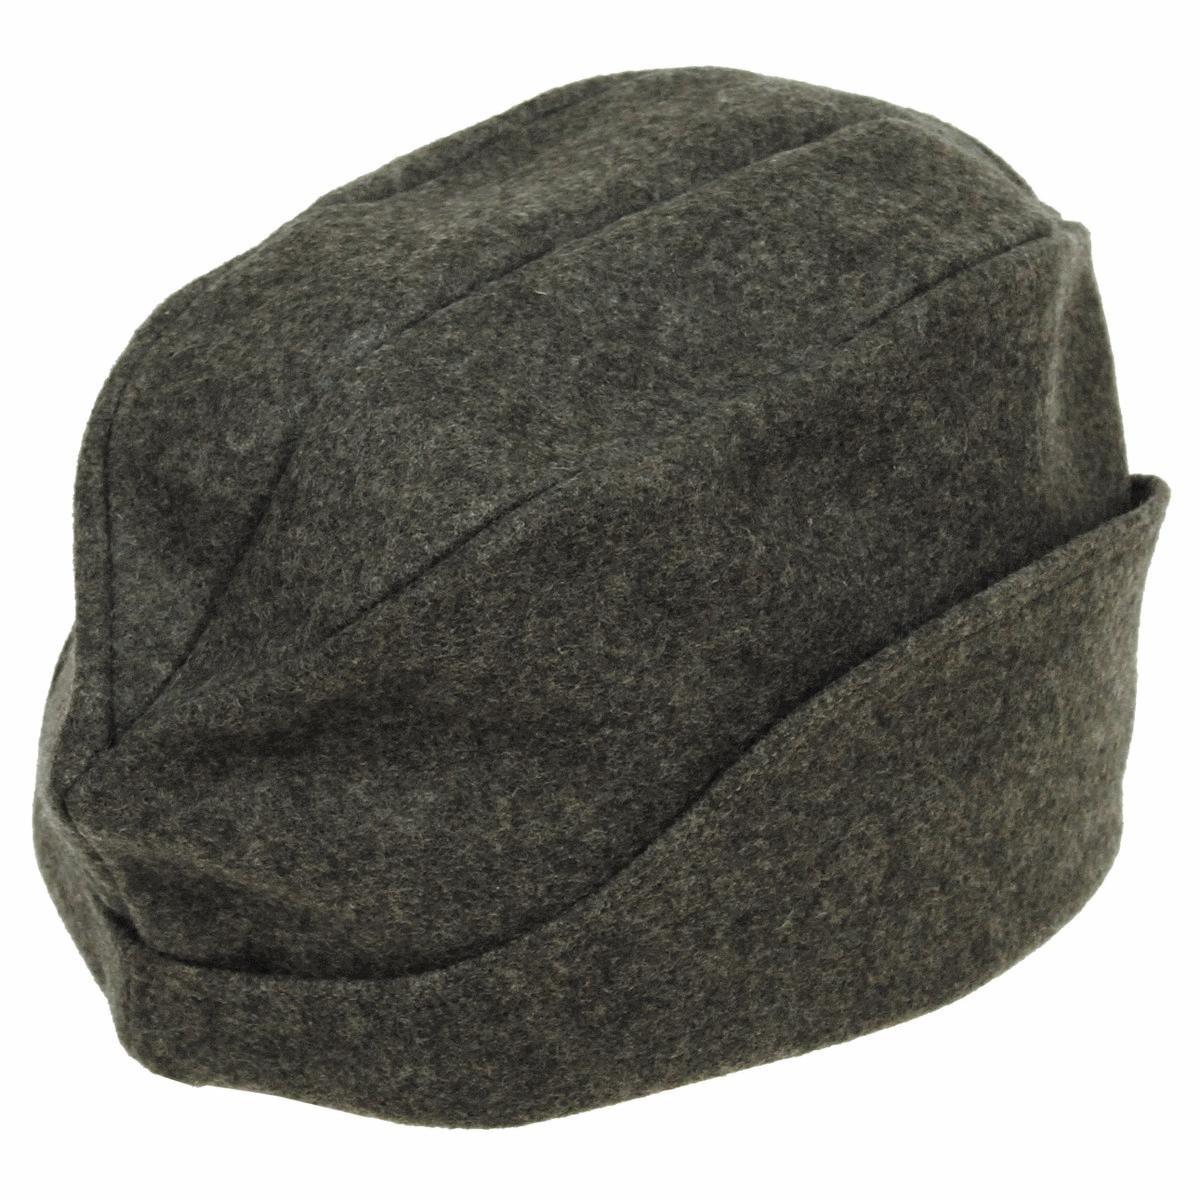 b91282f2053 Details about Swiss army surplus WW2 green grey felt cap vintage